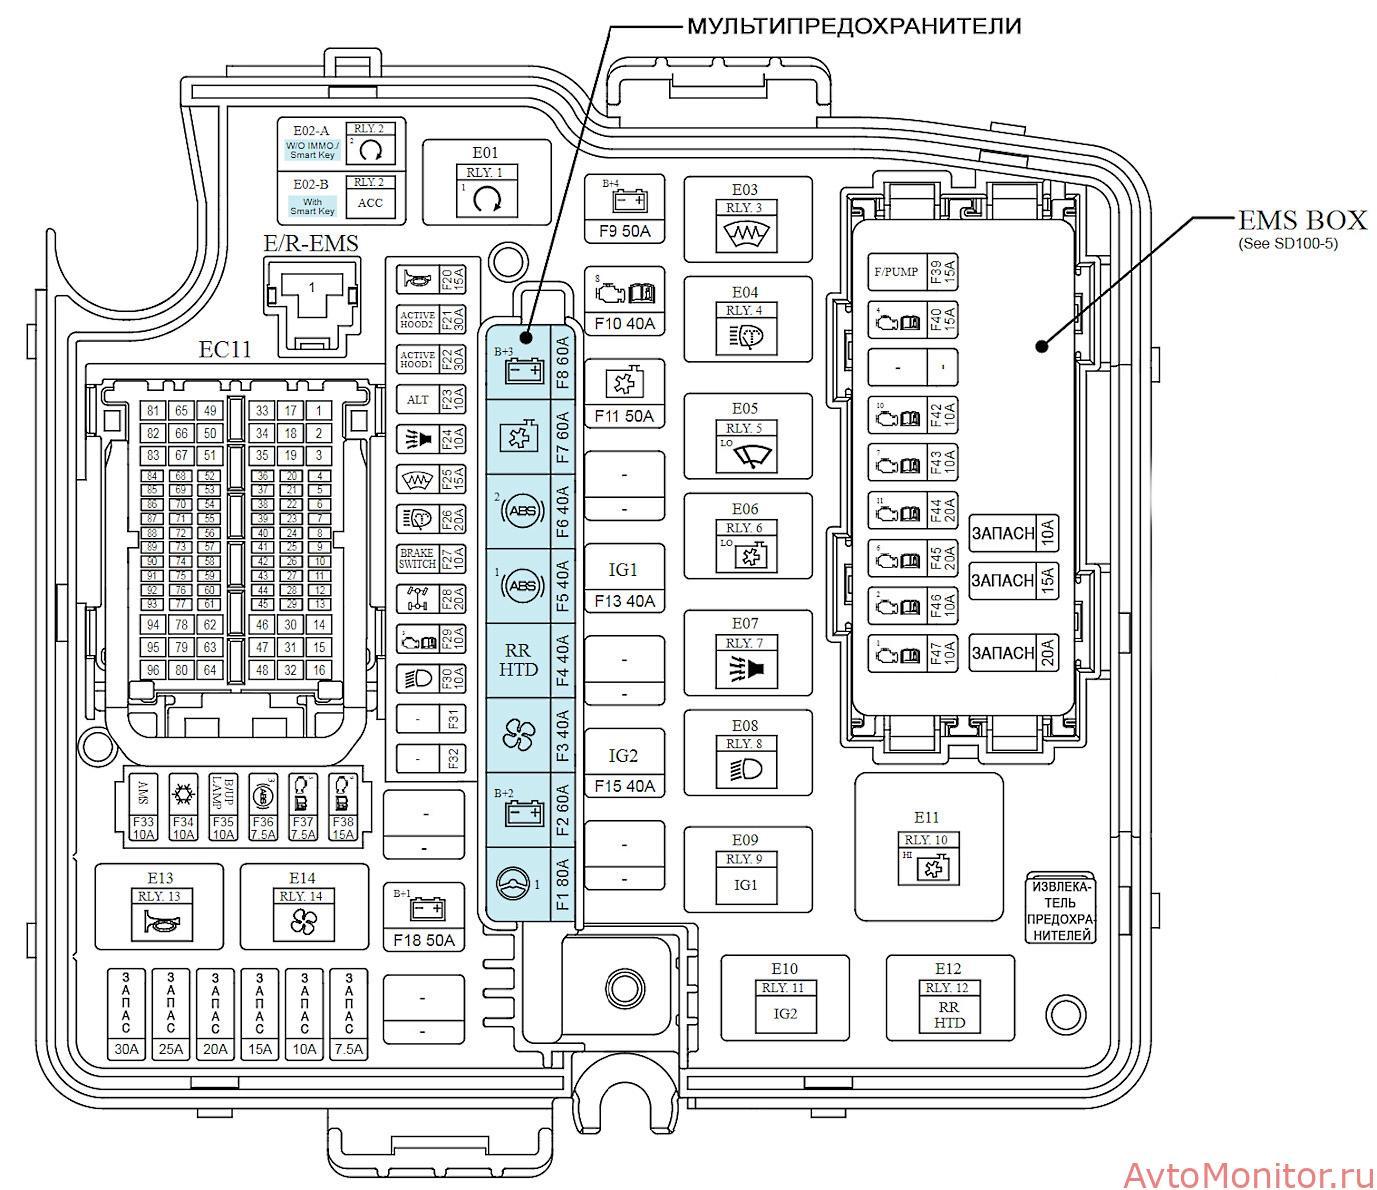 Схема подкапотного блока Kia Sorento 2